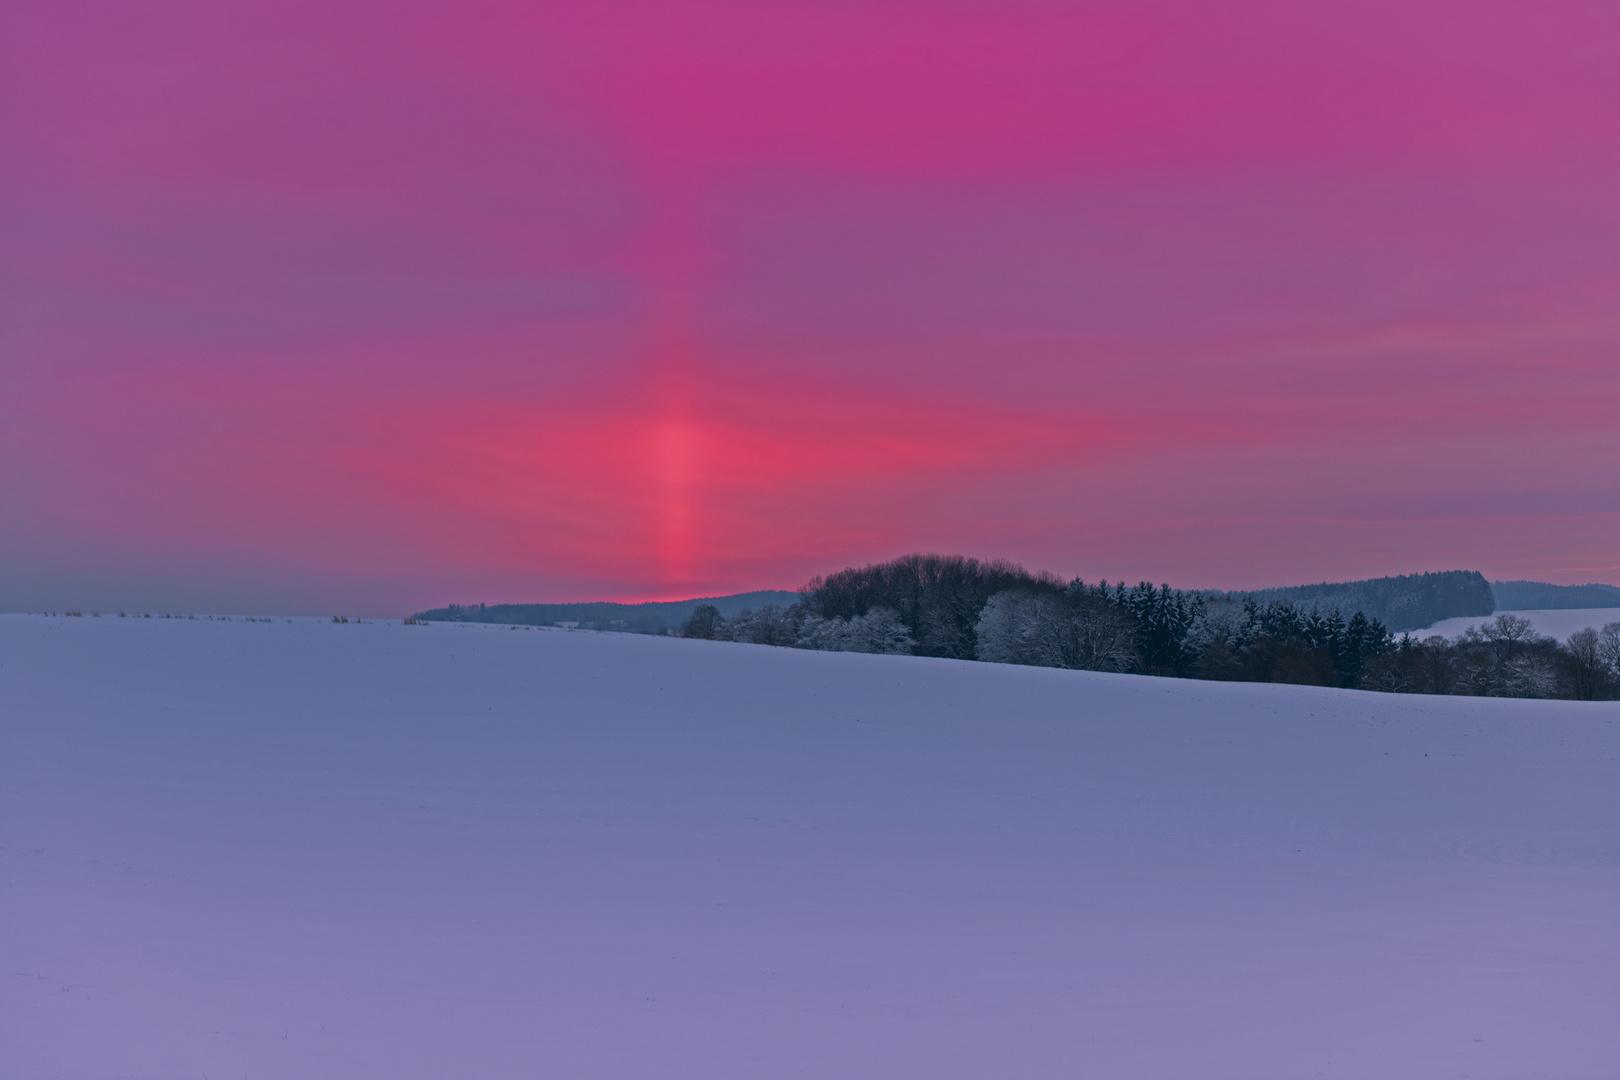 Sonnenuntergang im Wittelsbacher Land